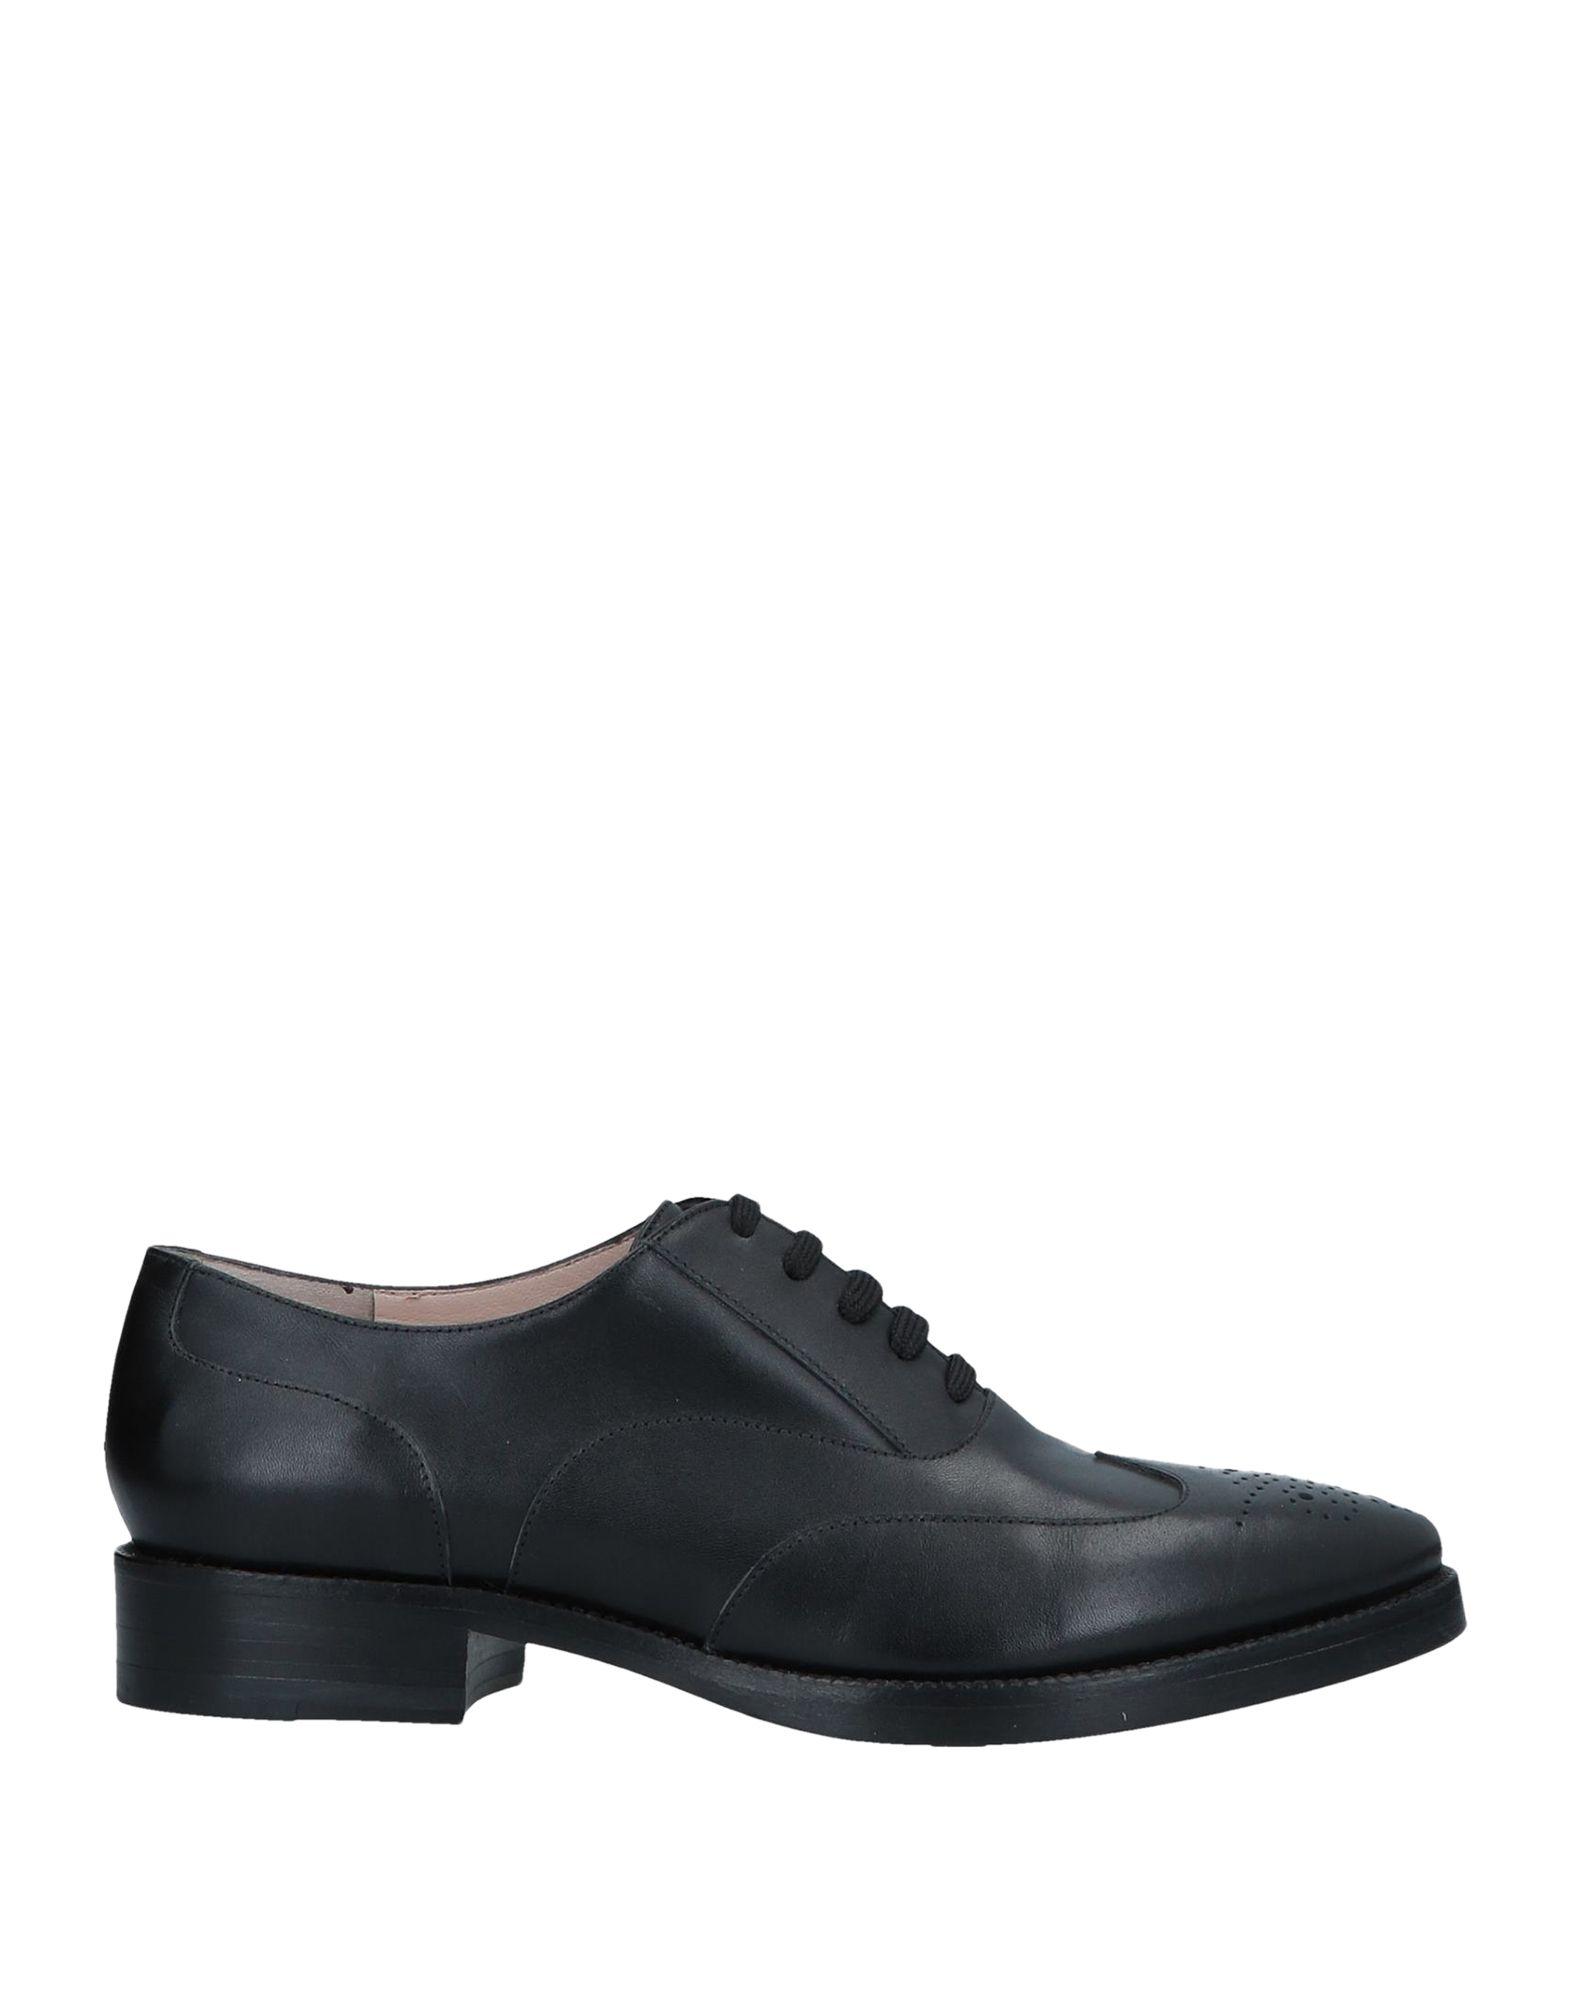 CAVALLINI Обувь на шнурках обувь на высокой платформе its own brand 116 31 32 33